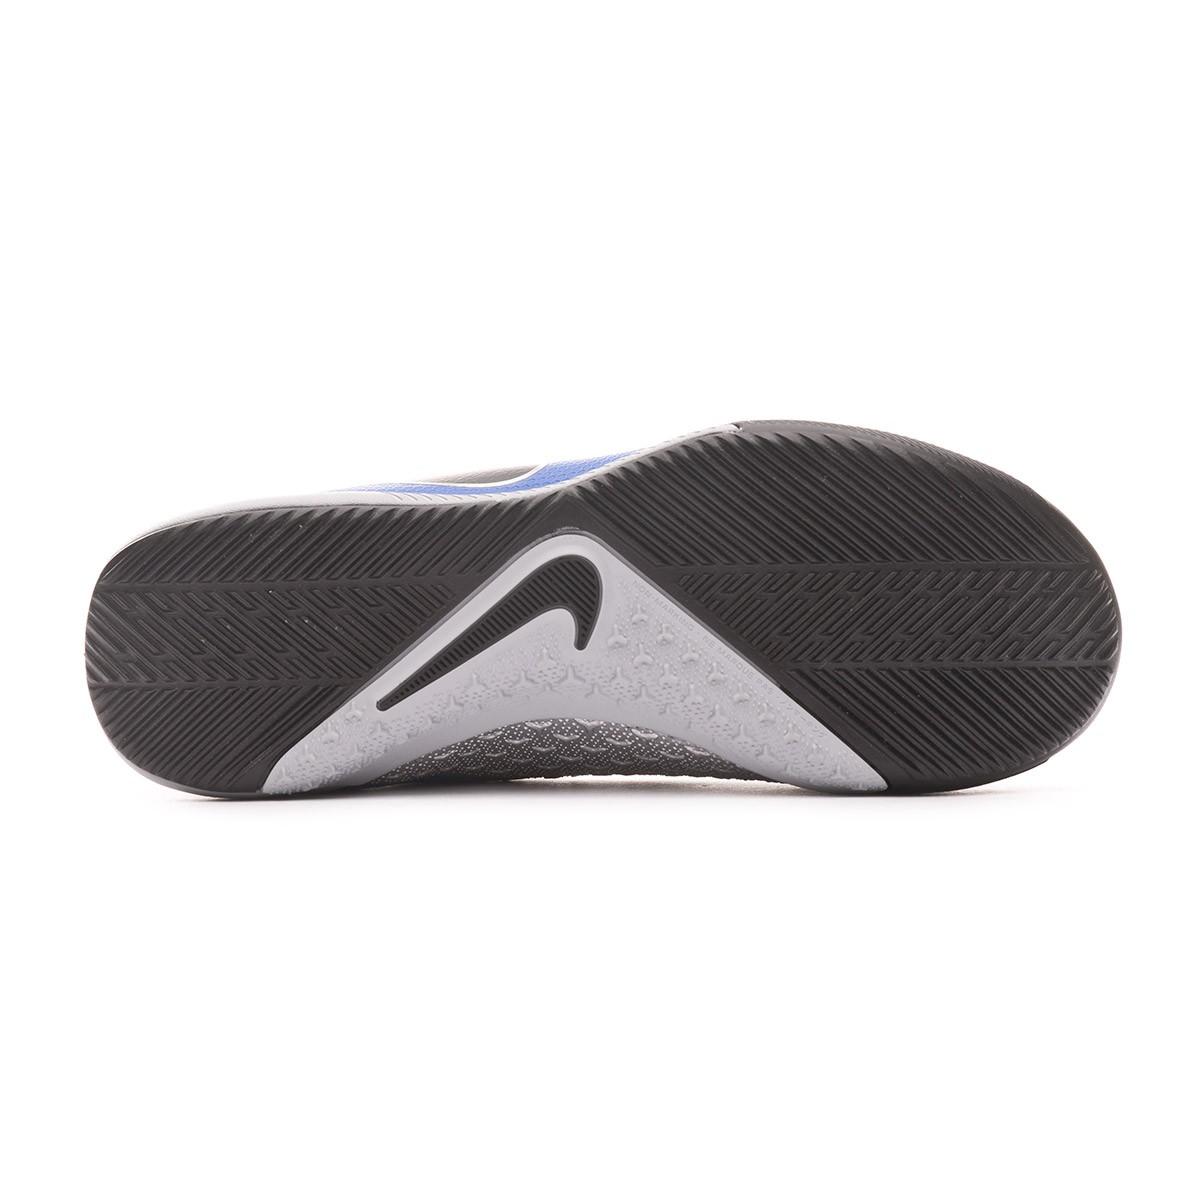 6f5dae35ac62d Zapatilla Nike Phantom Vision Academy DF IC Niño Racer blue-Black - Tienda  de fútbol Fútbol Emotion